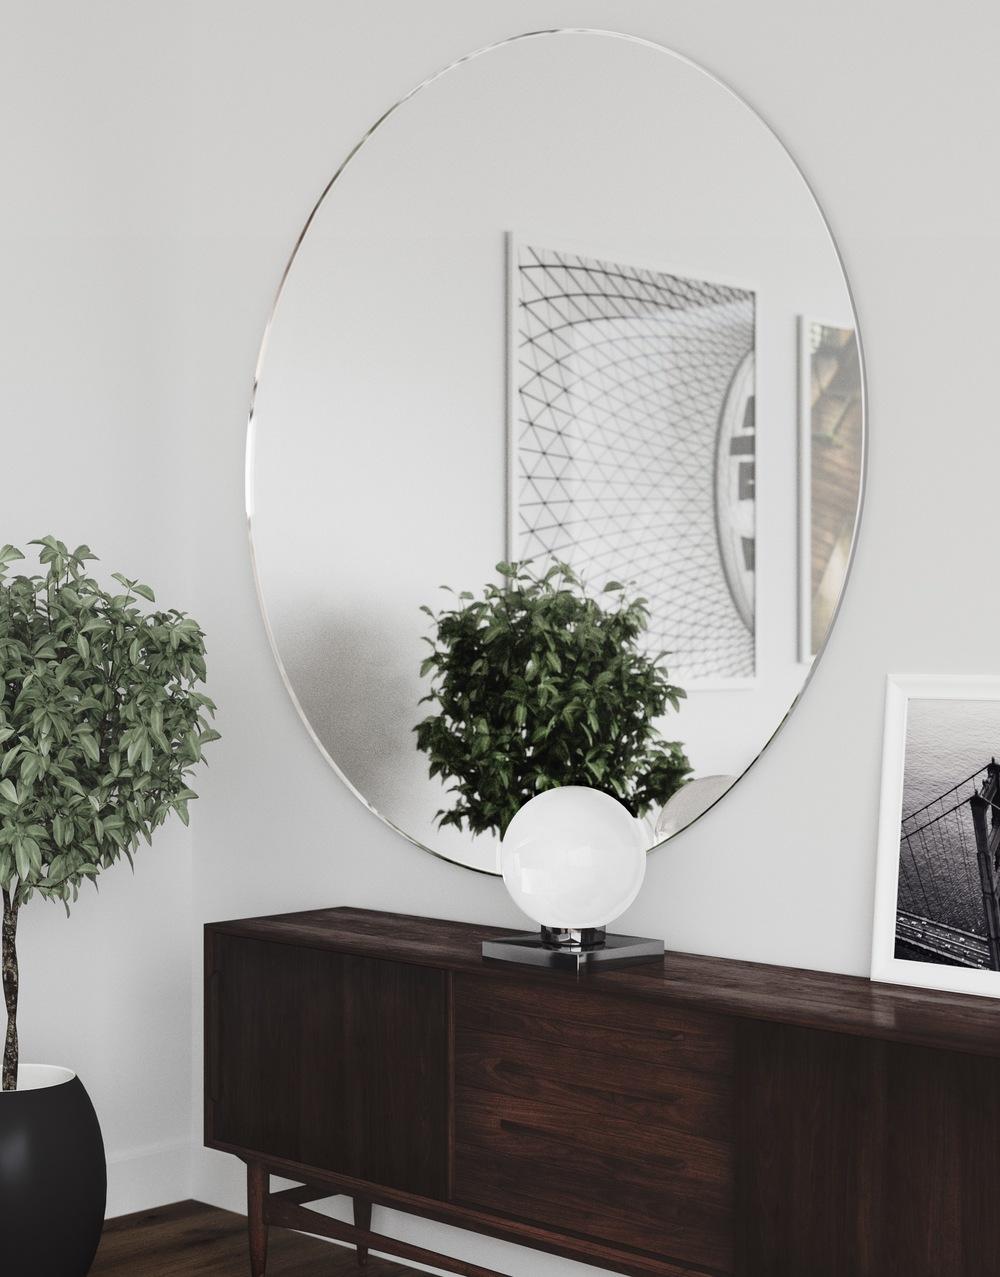 mirror coop. Black Bedroom Furniture Sets. Home Design Ideas